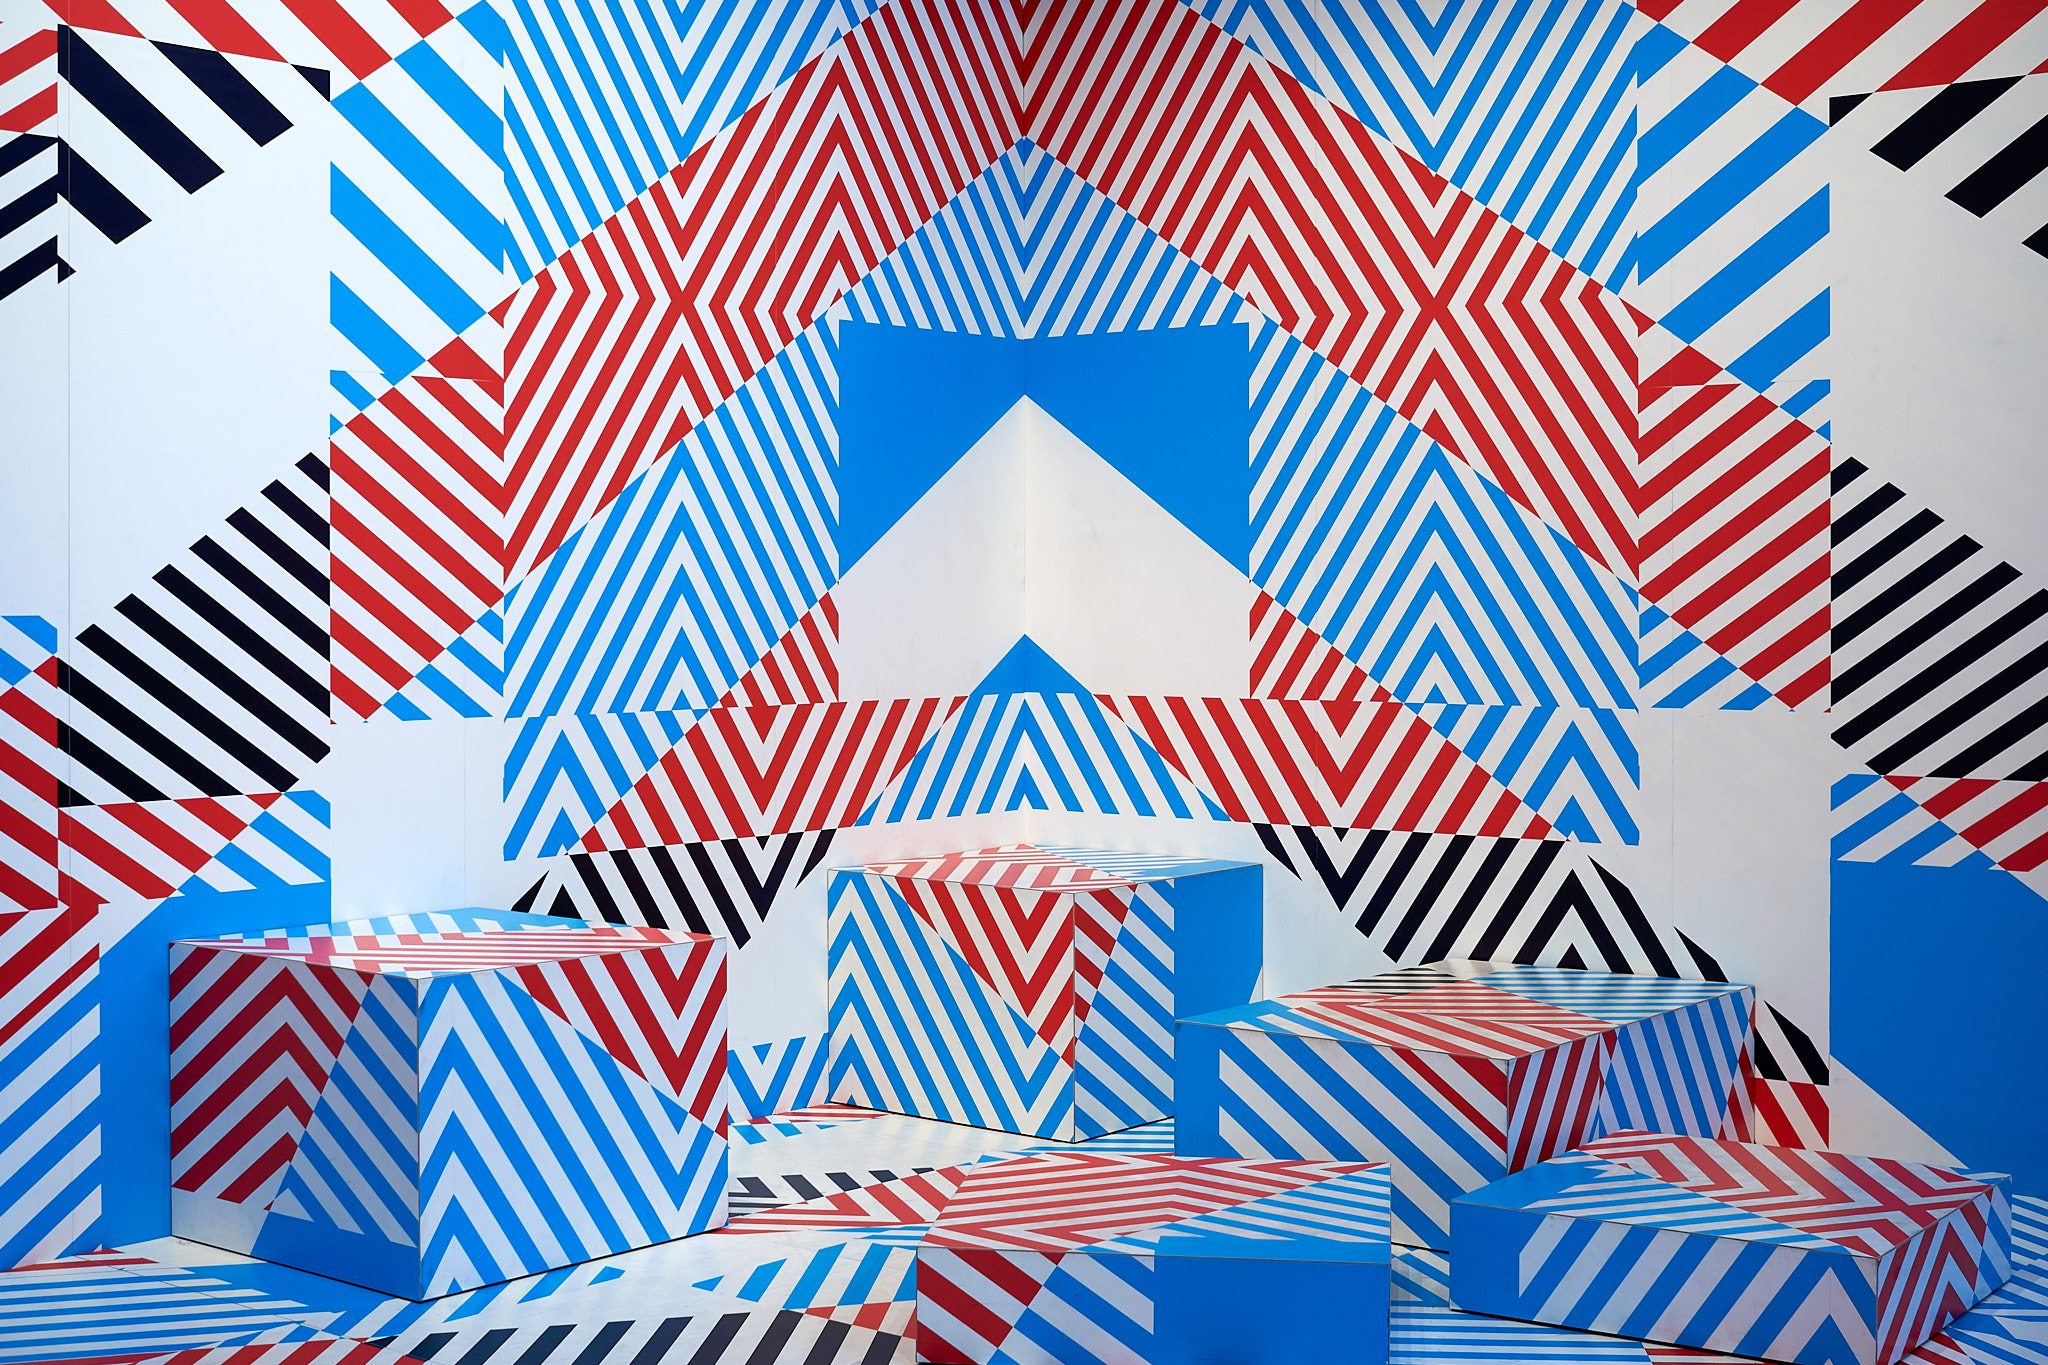 Iannis Xenakis – Rebonds A und B (1987/88)